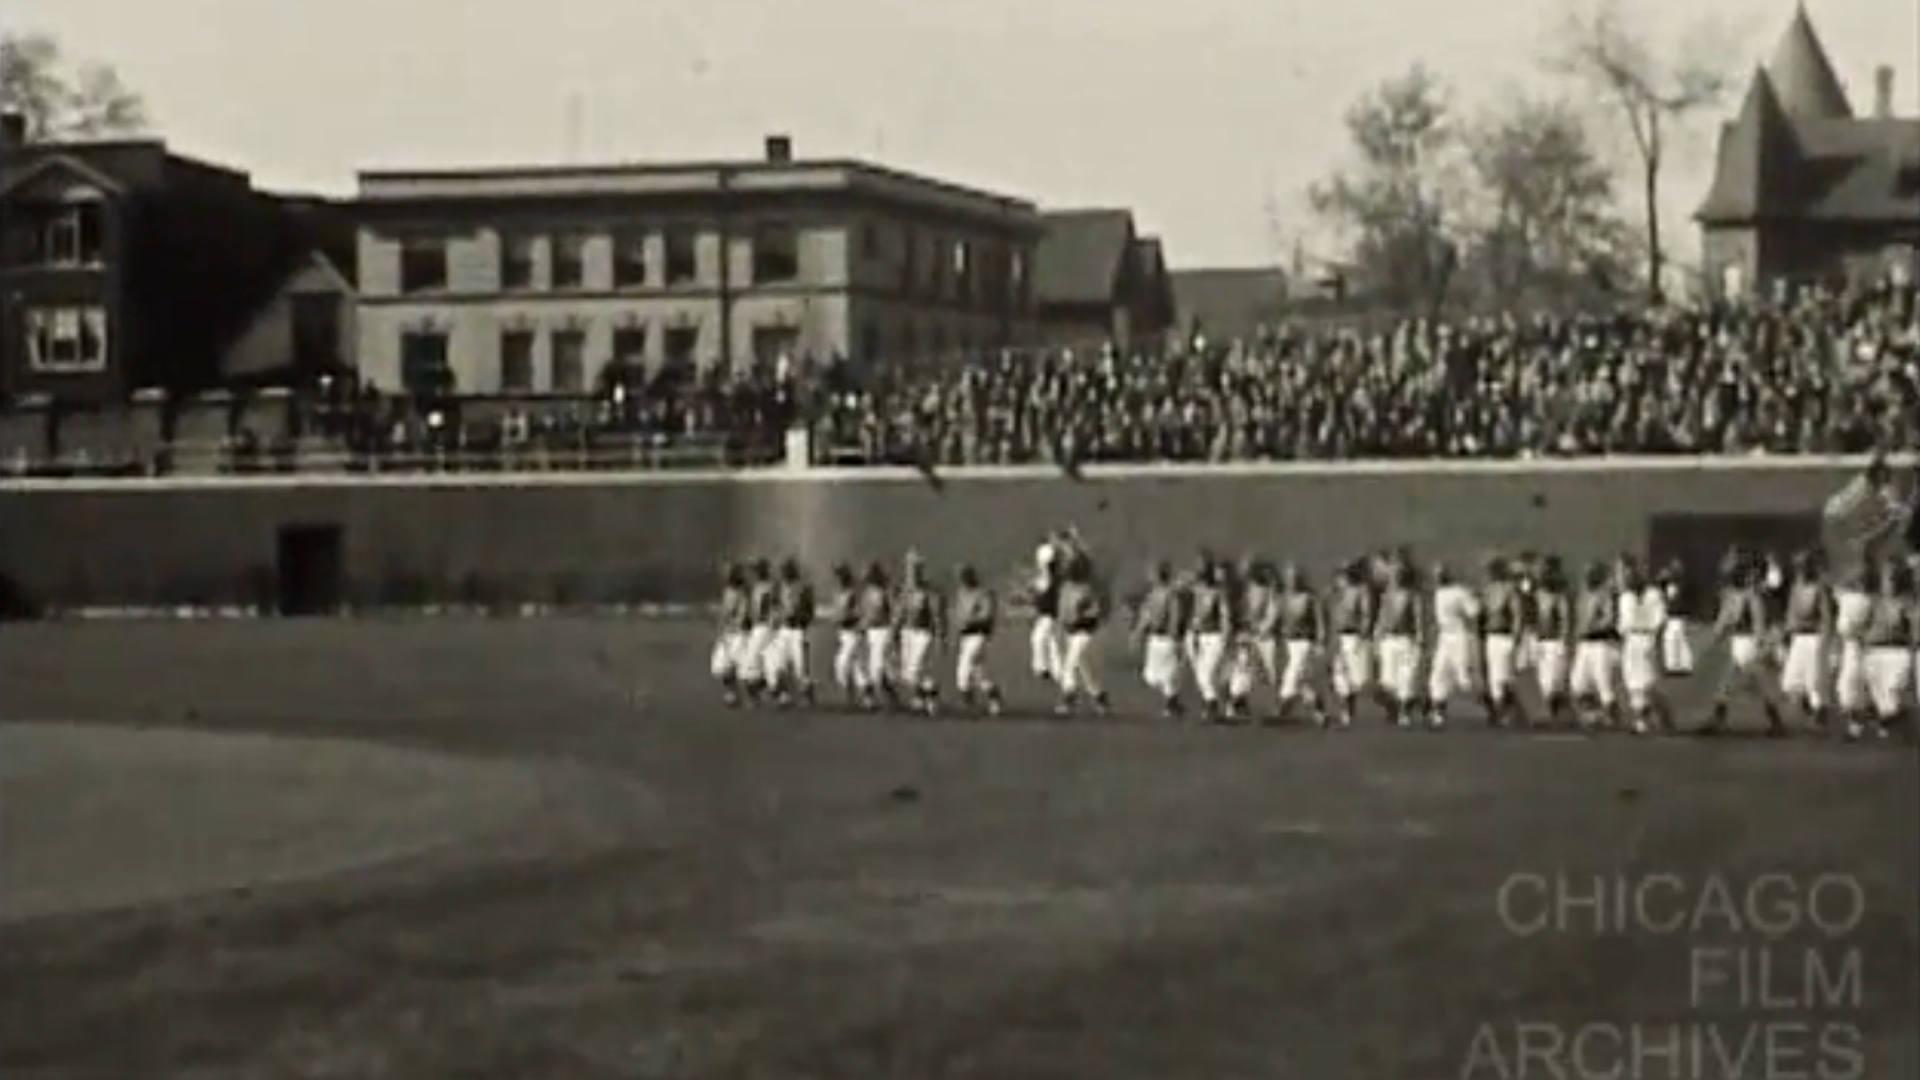 Wrigley-Field-footage-Chicago-Film_archives-FTR.jpg